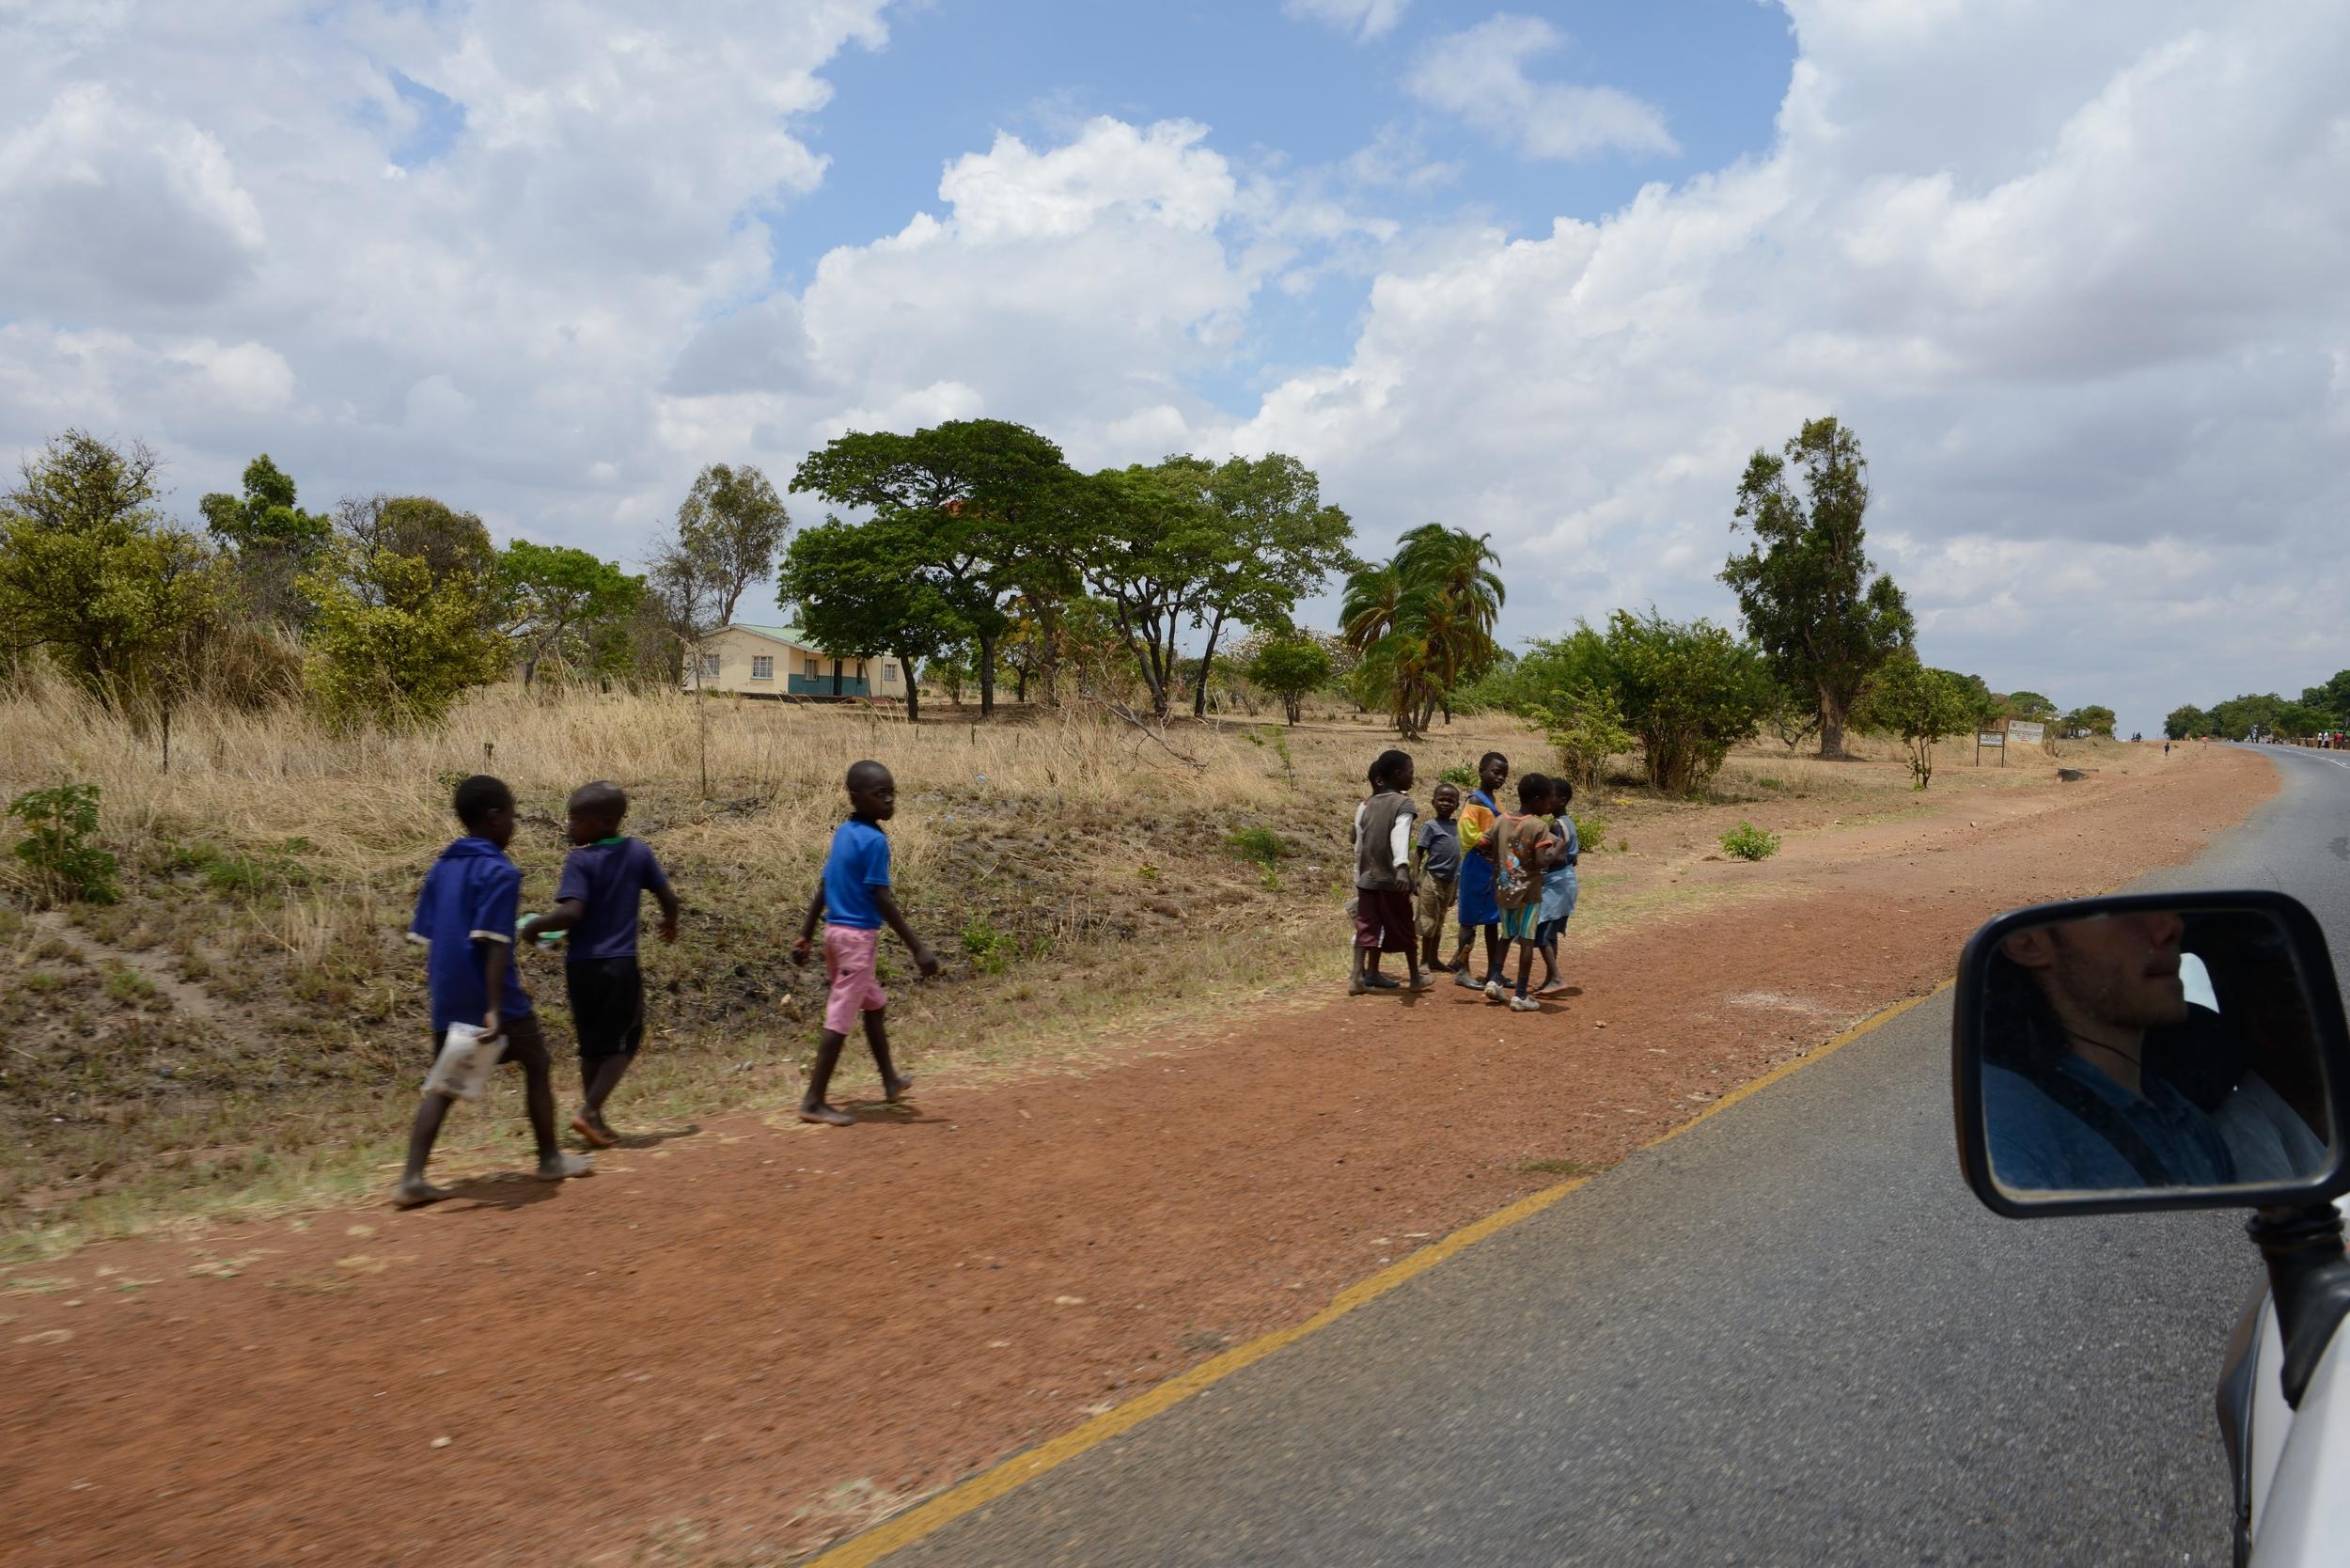 Malawian roads near Mzuzu